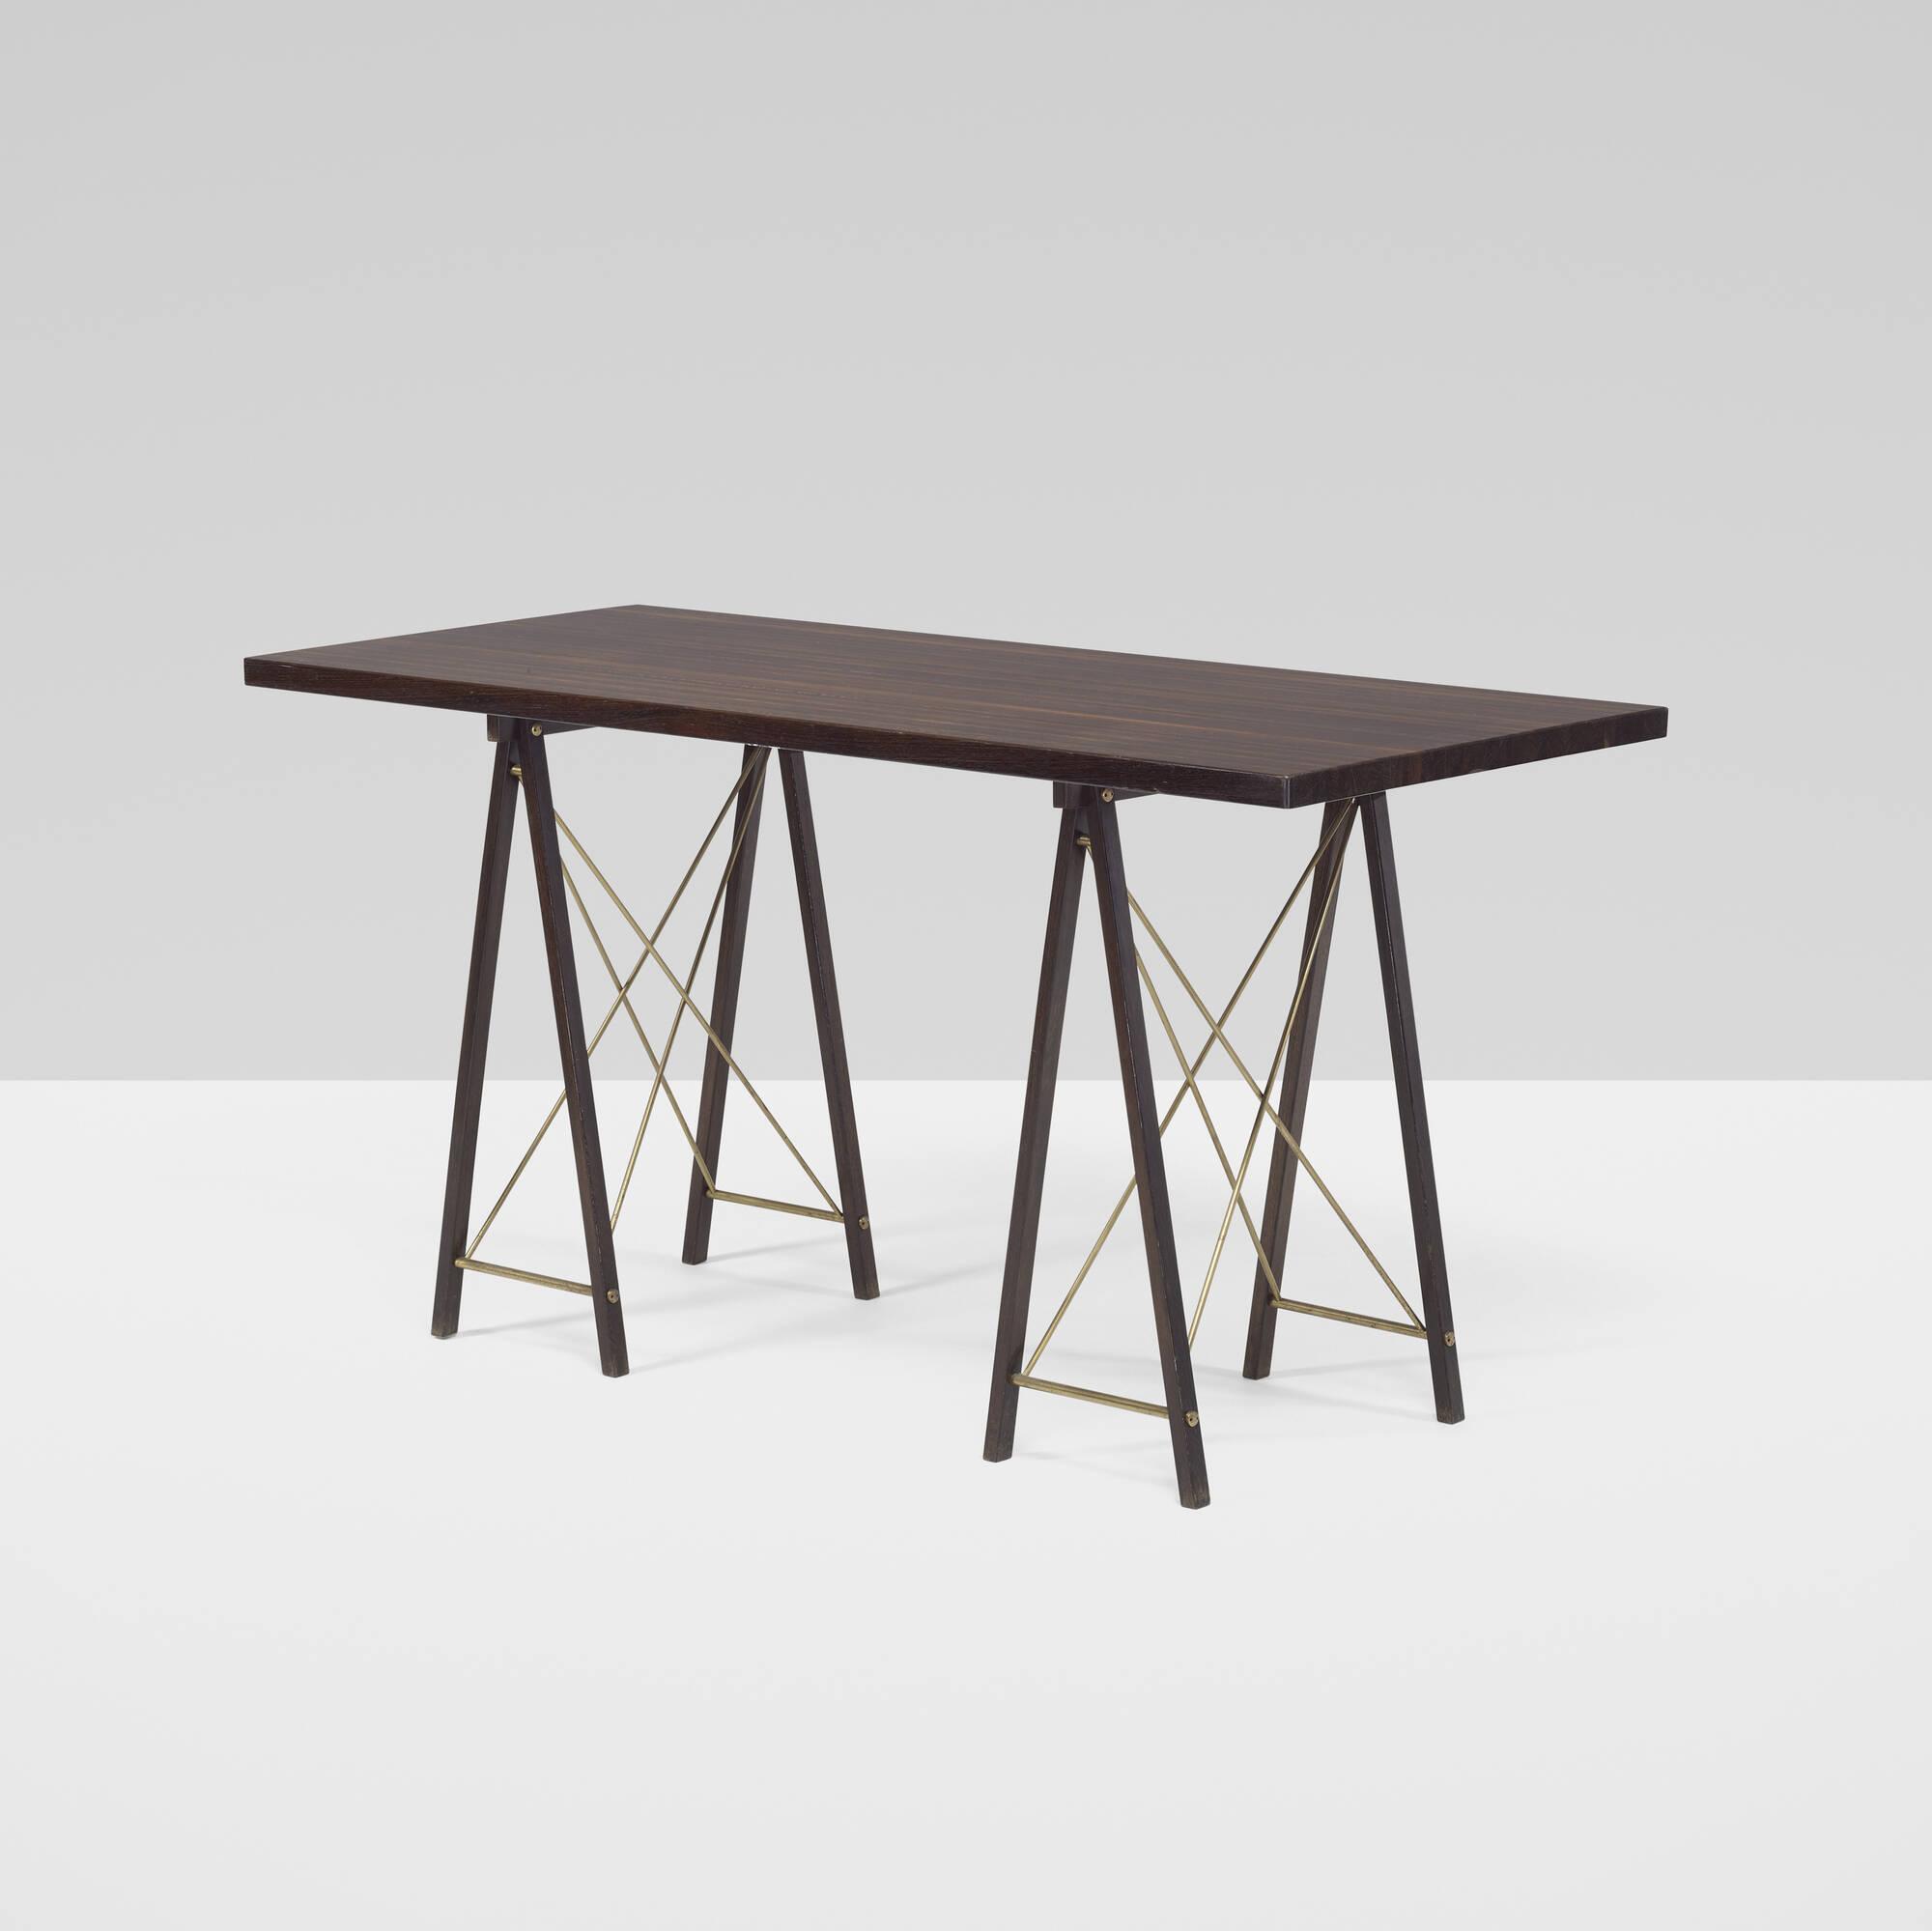 405: Jules Wabbes / Trestle desk (1 of 1)